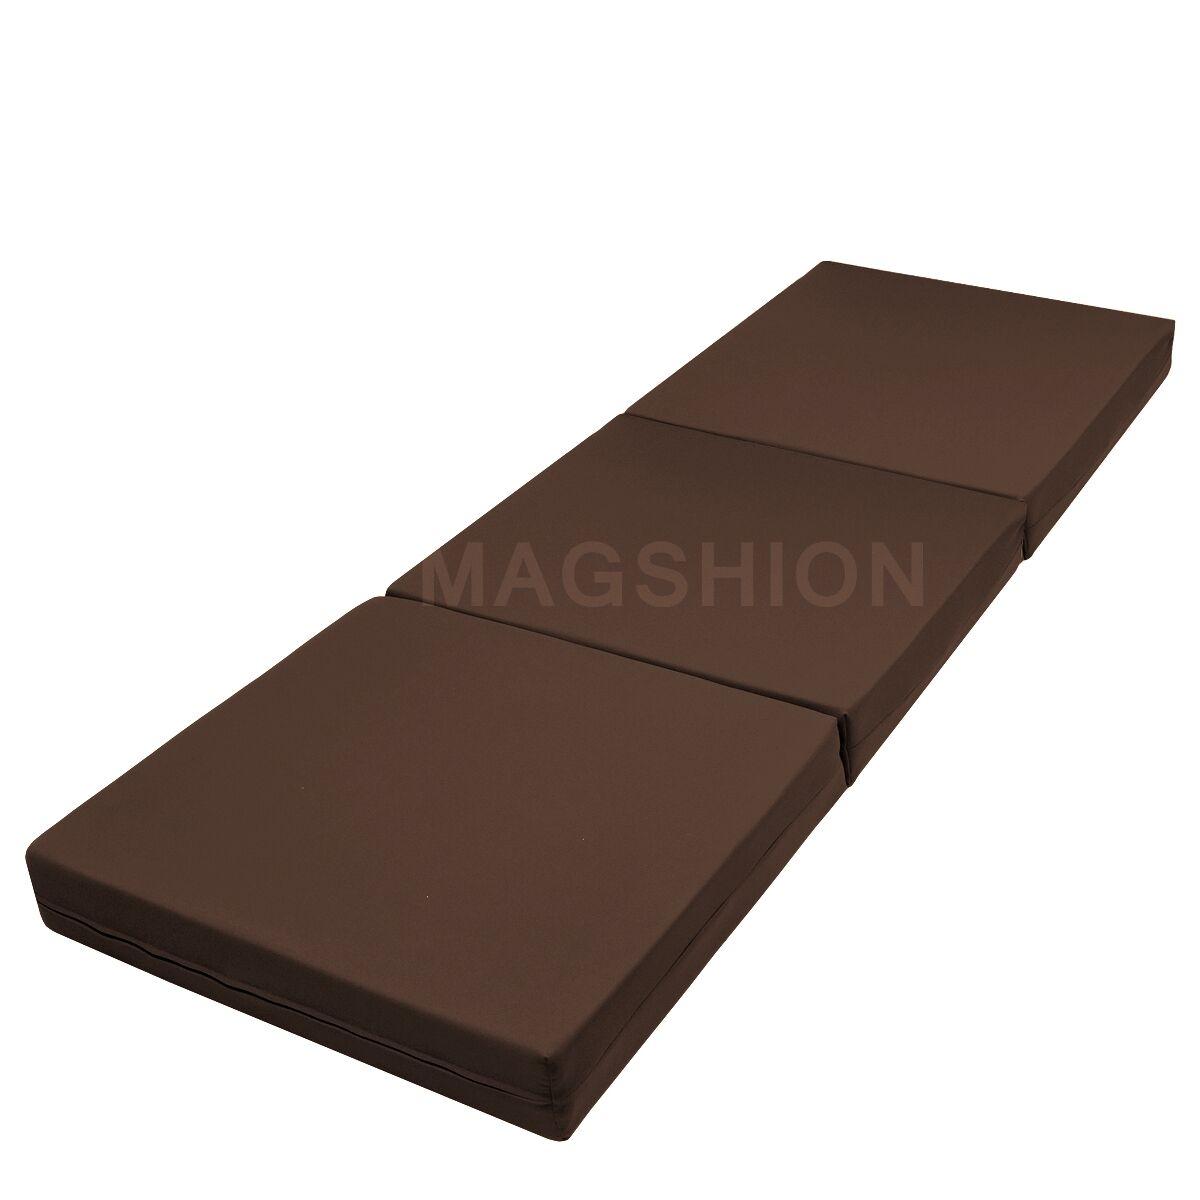 fold up bed chair foam metal restaurant chairs floor mattress tatami mat trifold folding mattresses - brown | ebay